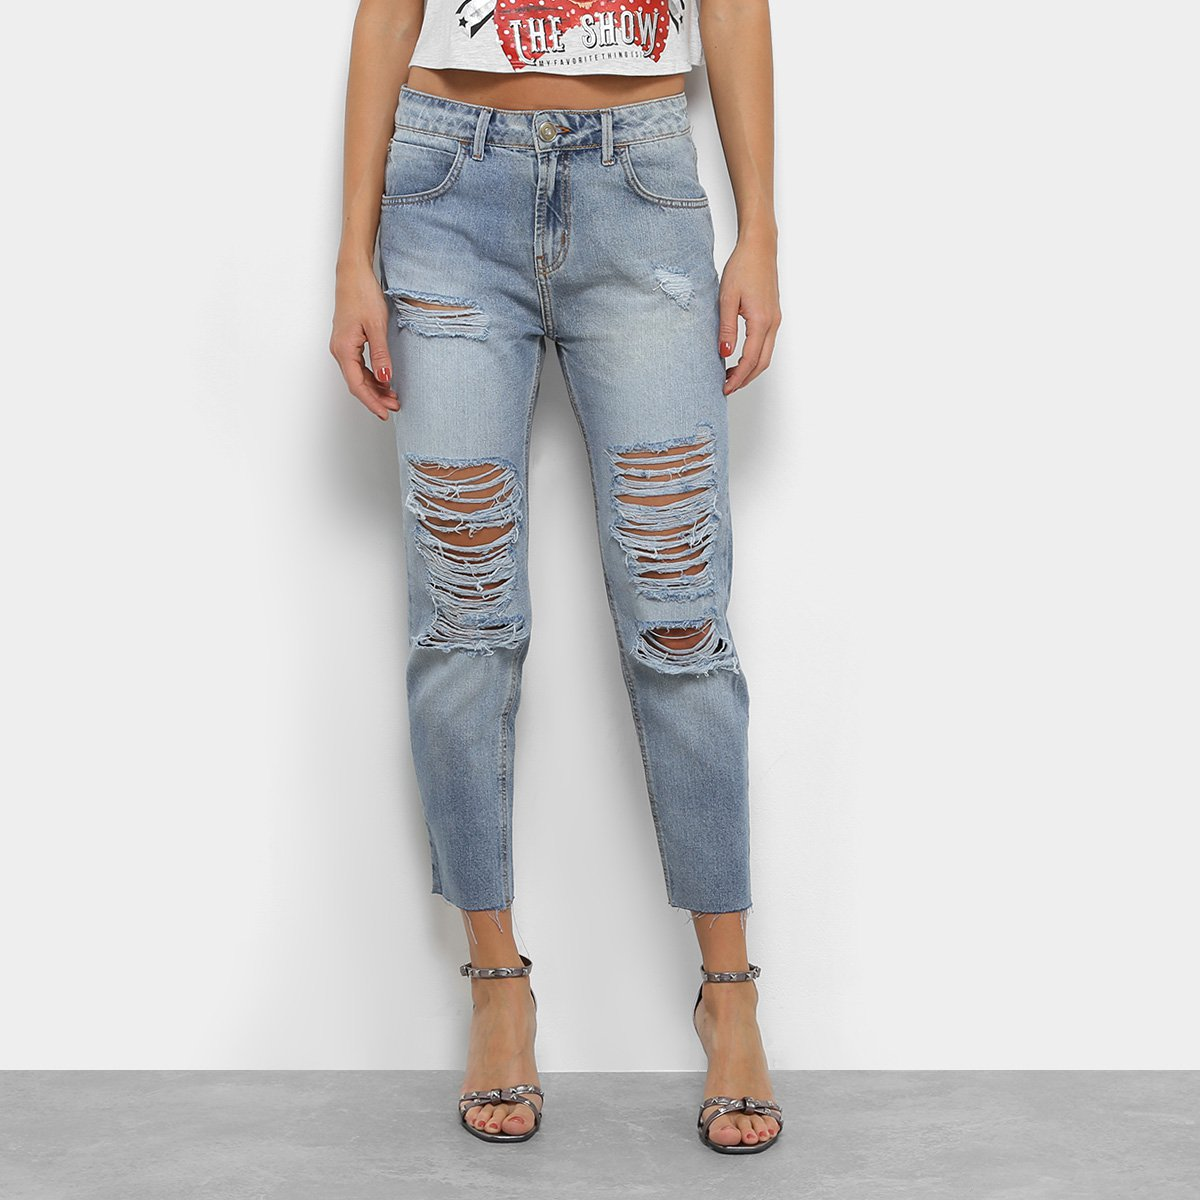 c06365807 Calça Jeans Boyfriend Coca-Cola Destroyed Cintura Alta Feminina. undefined